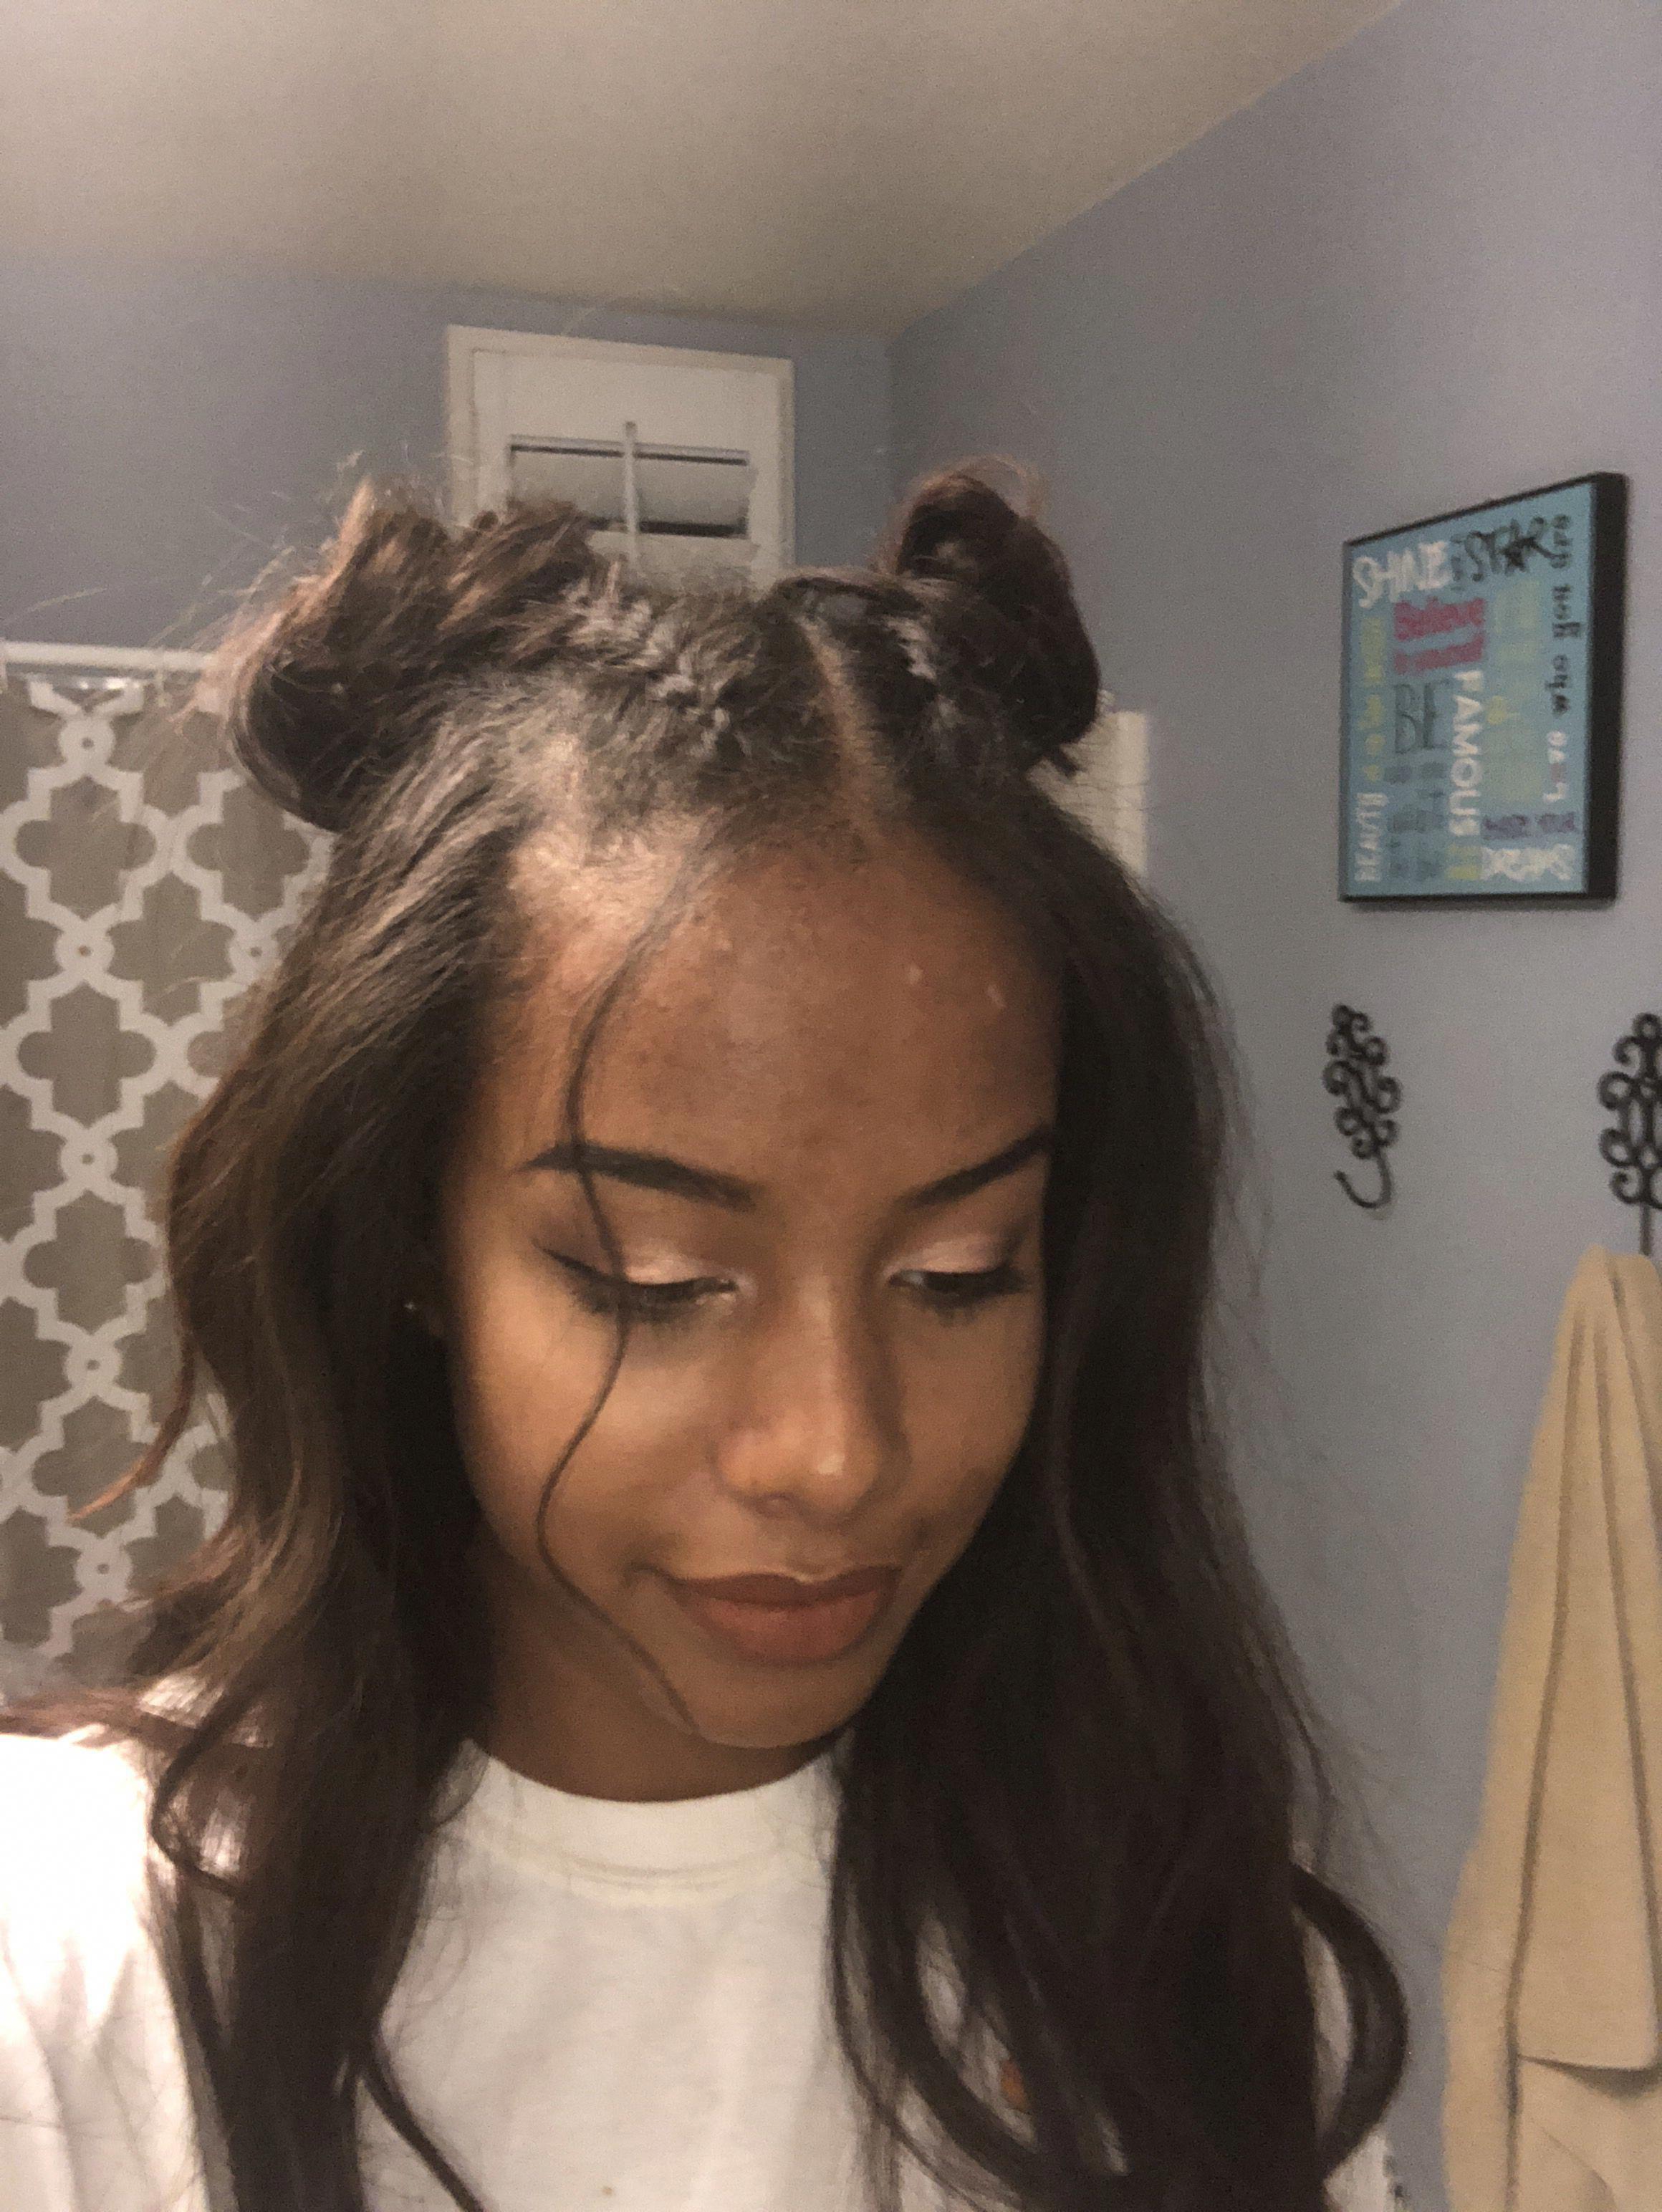 Double Bun Dutch Braid With Curled Hair Half Up Half Down Promhairstyleshalfuphalfdown Half Up Hair Hairstyles With Curled Hair Half Up Curls